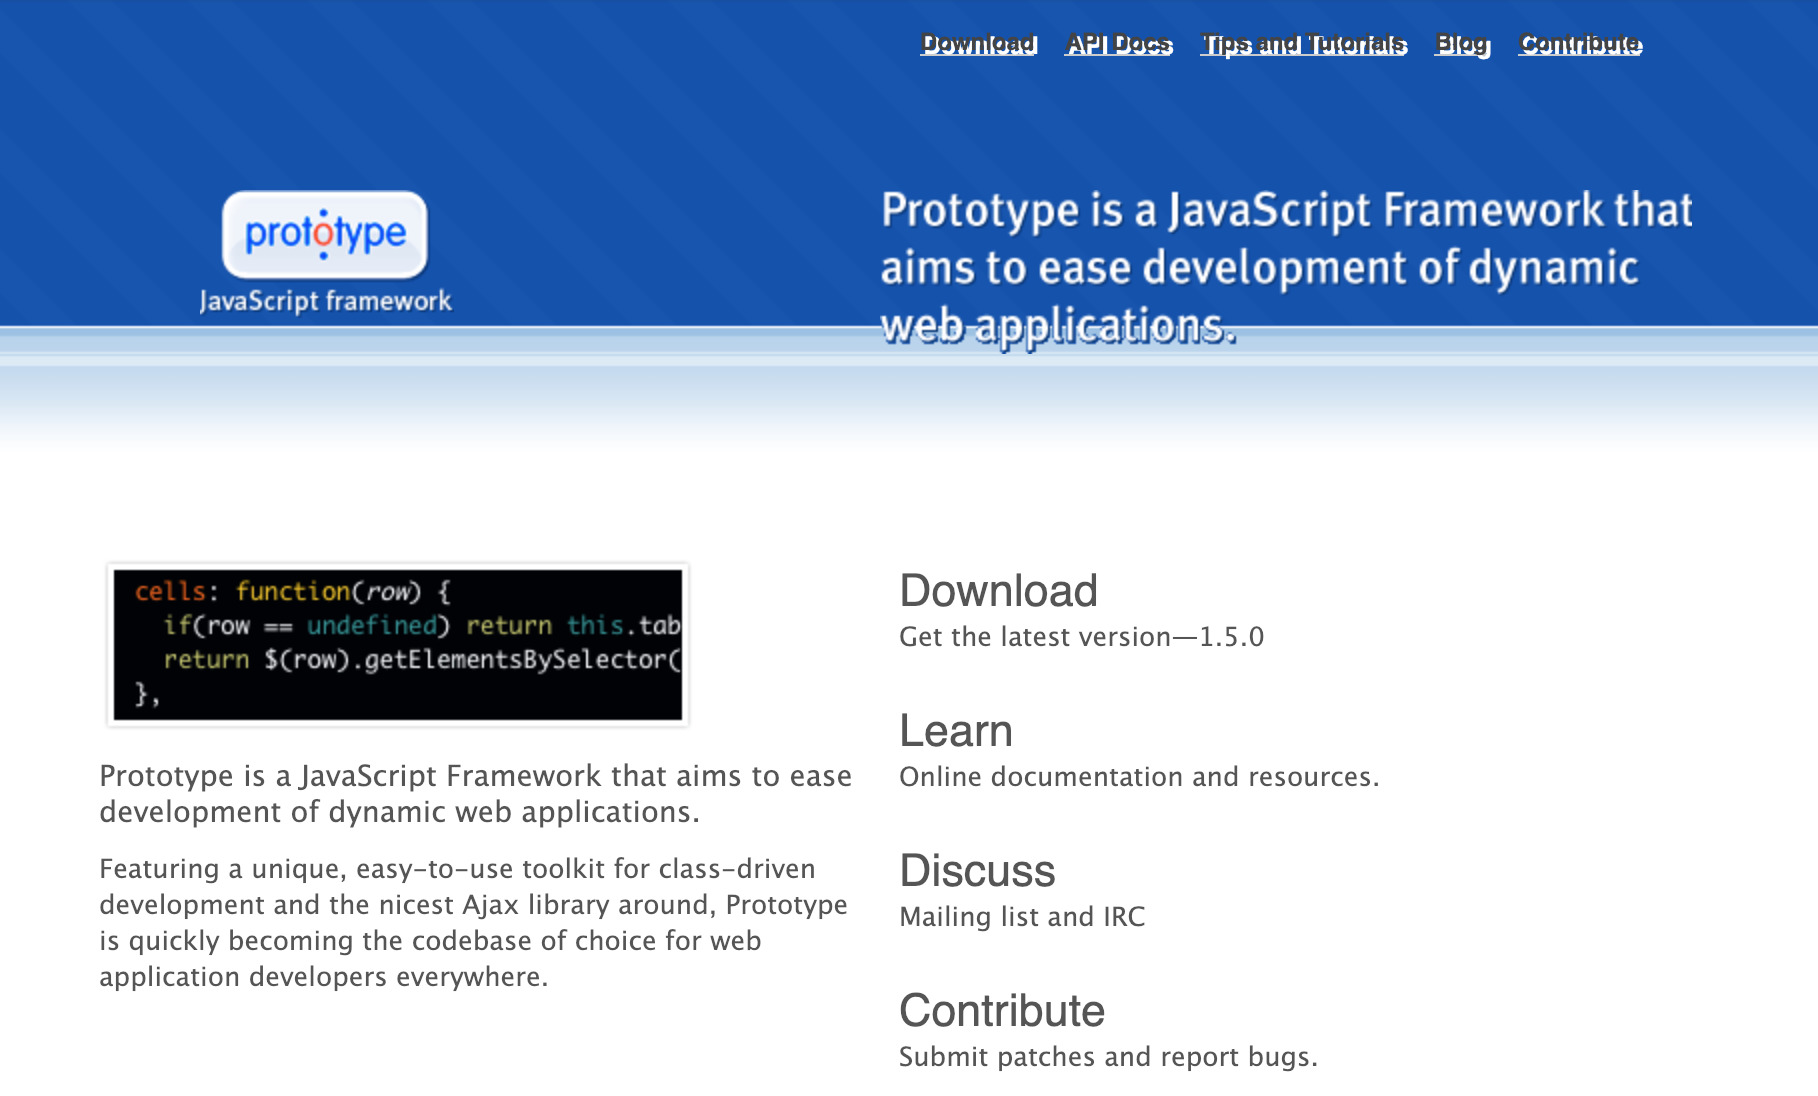 A screenshot of the Prototype website.